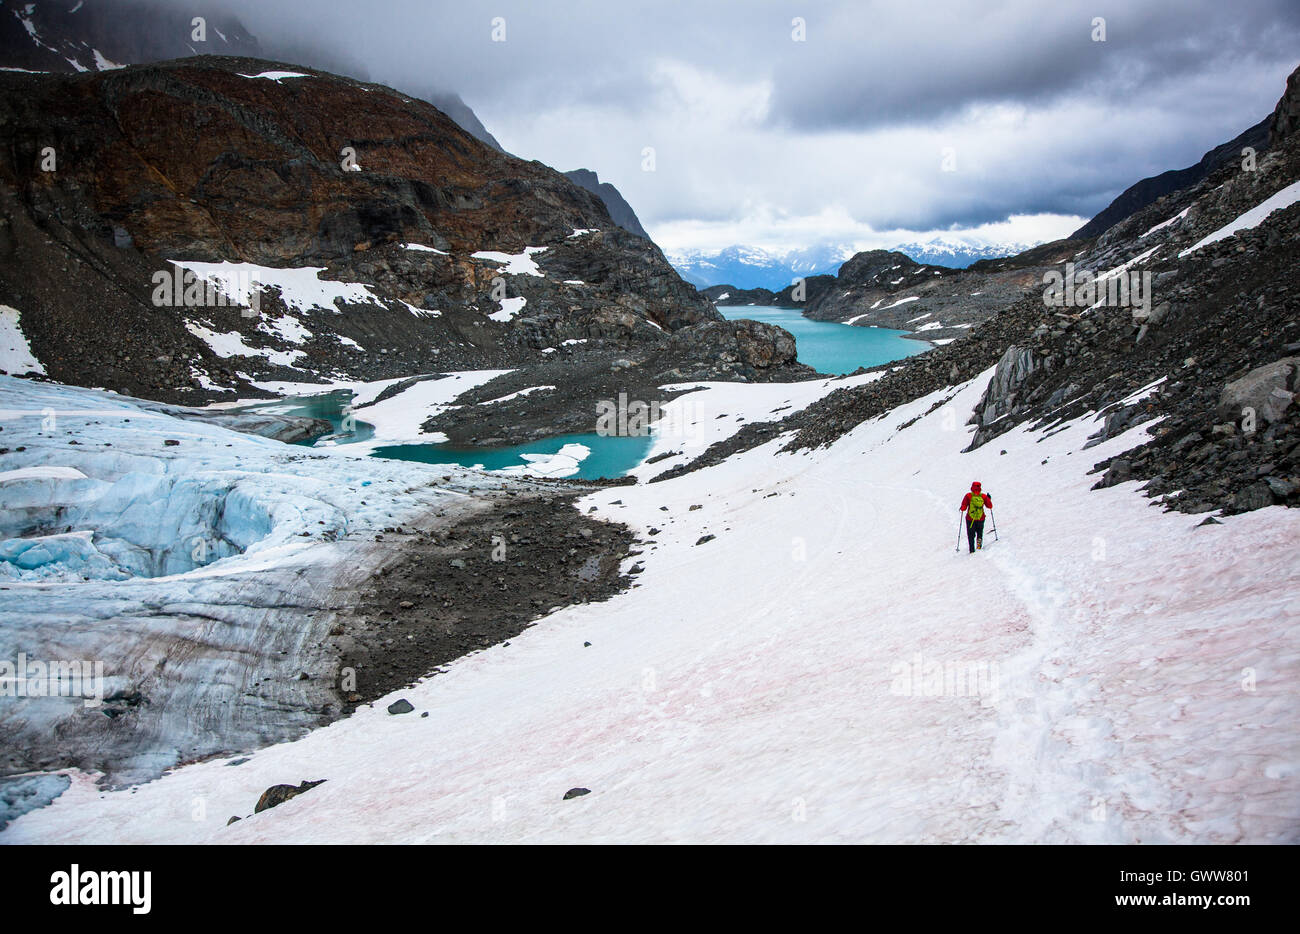 Back Country Exploration, Wedgmemount Lake, Whistler, British Columbia, Canada - Stock Image